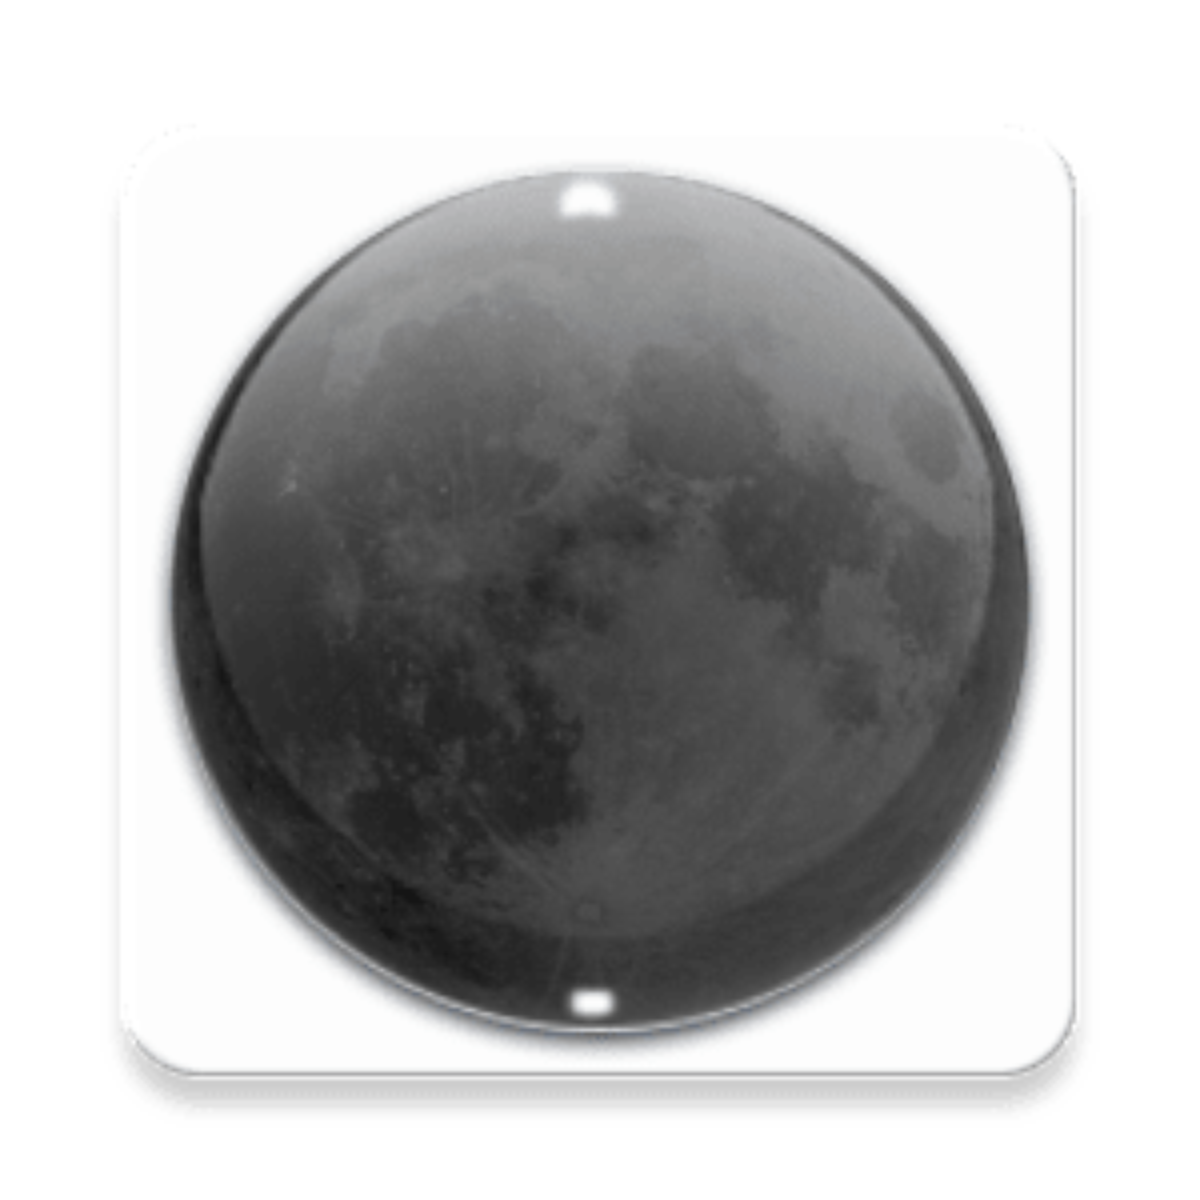 Moonlit Icon Pack - Nova / Apex / ADW